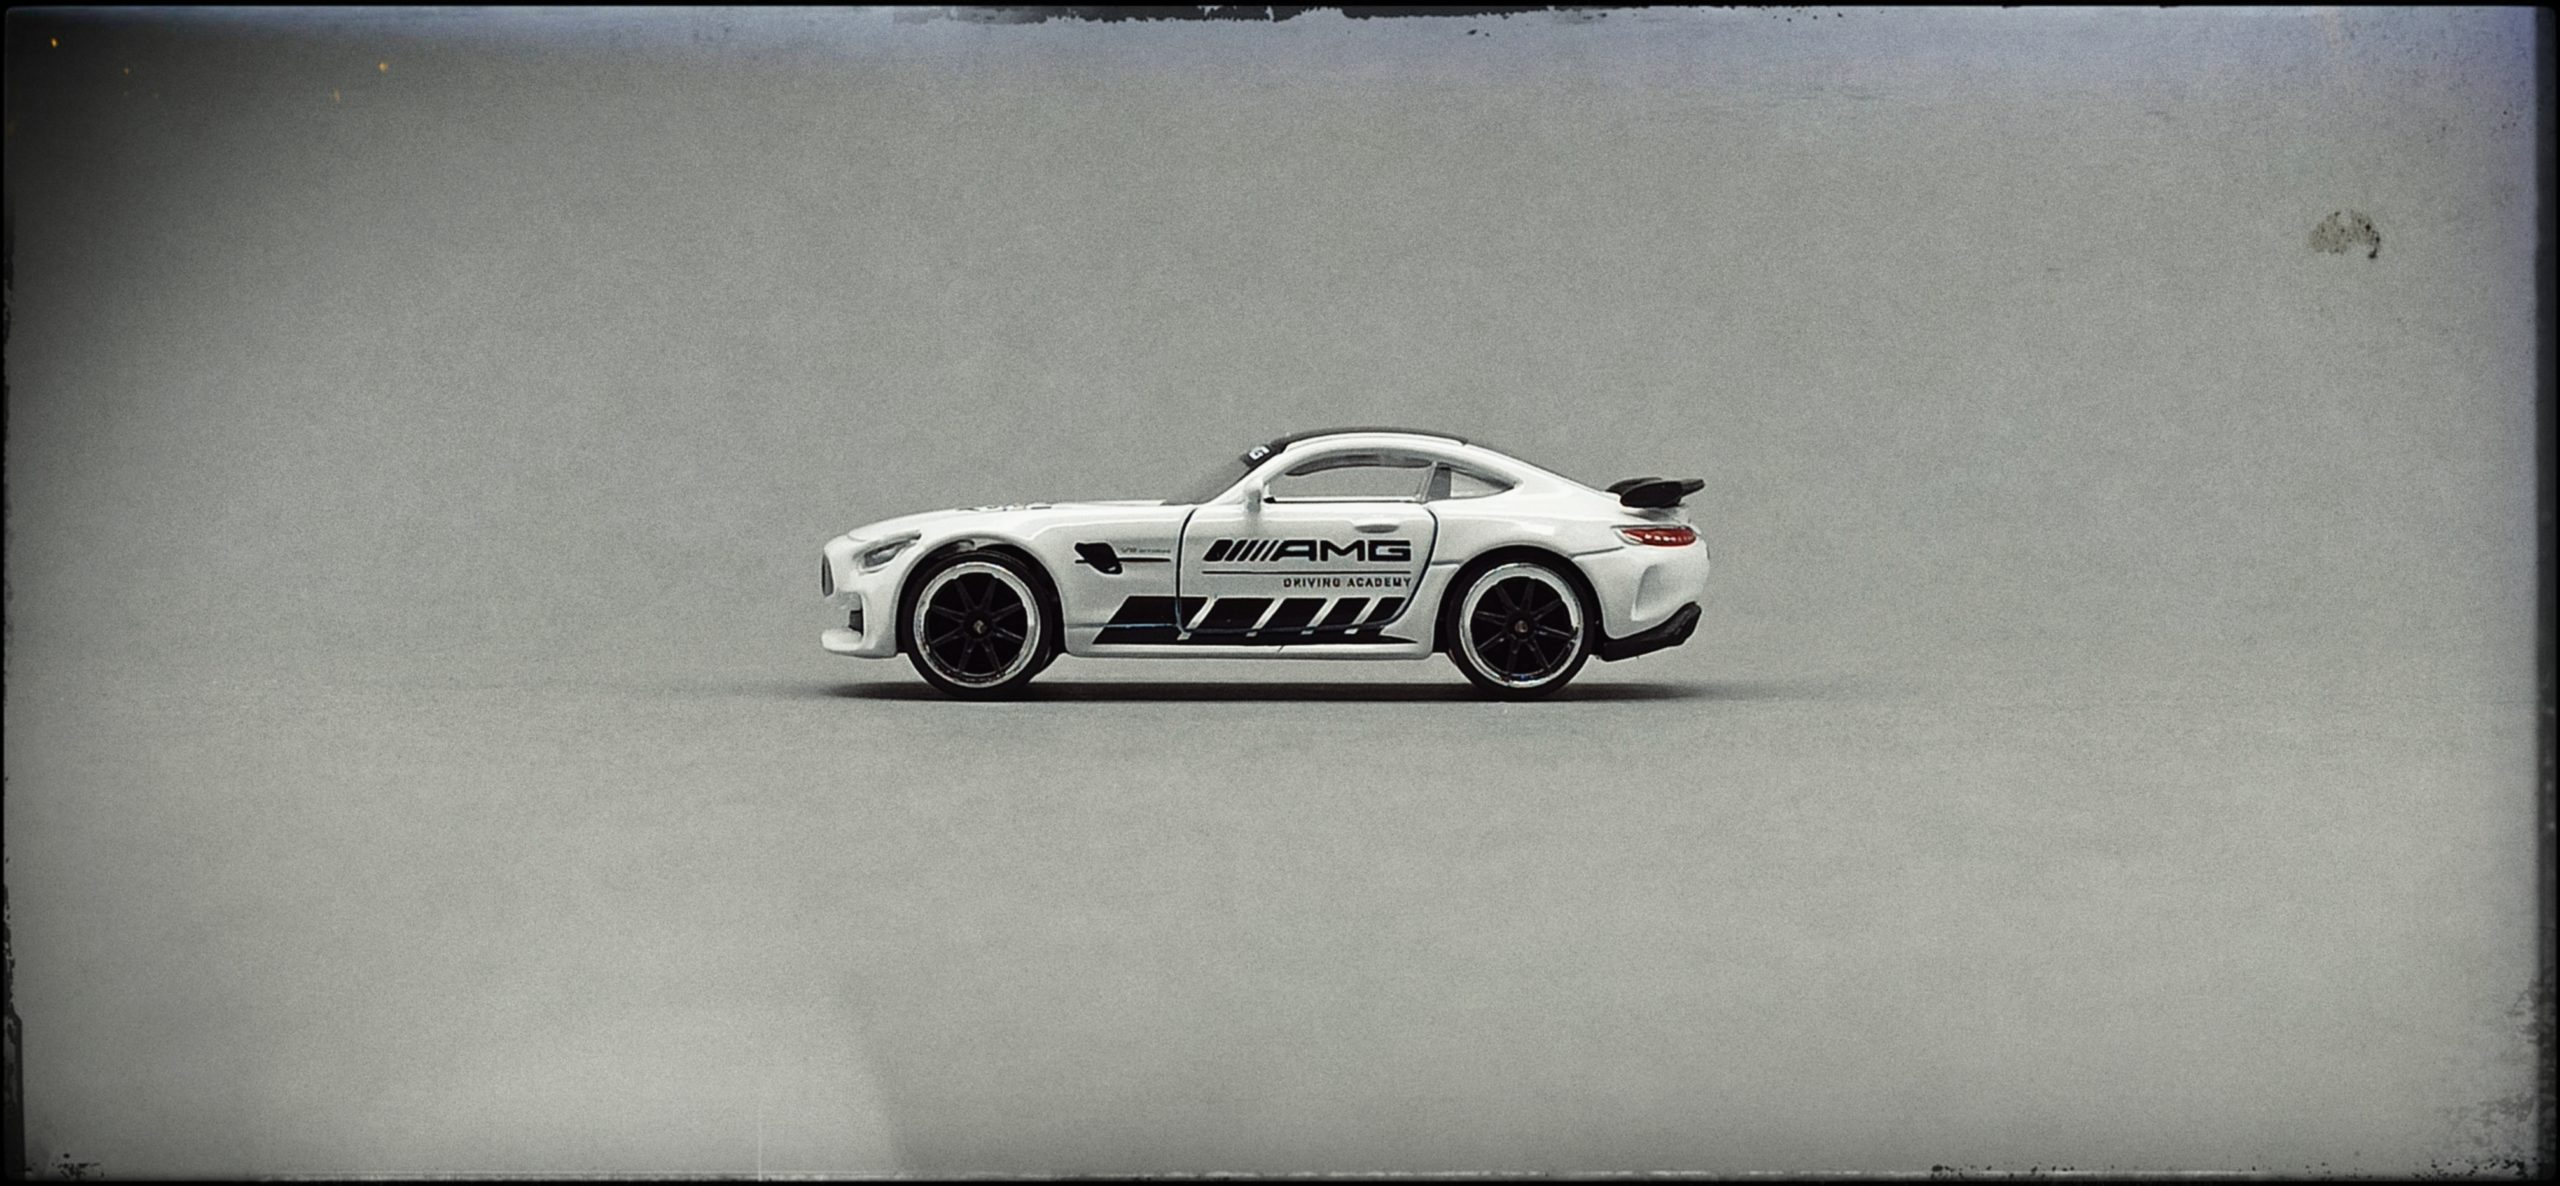 Majorette Mercedes-AMG GT R (9613) 2020 Racing Cars white side